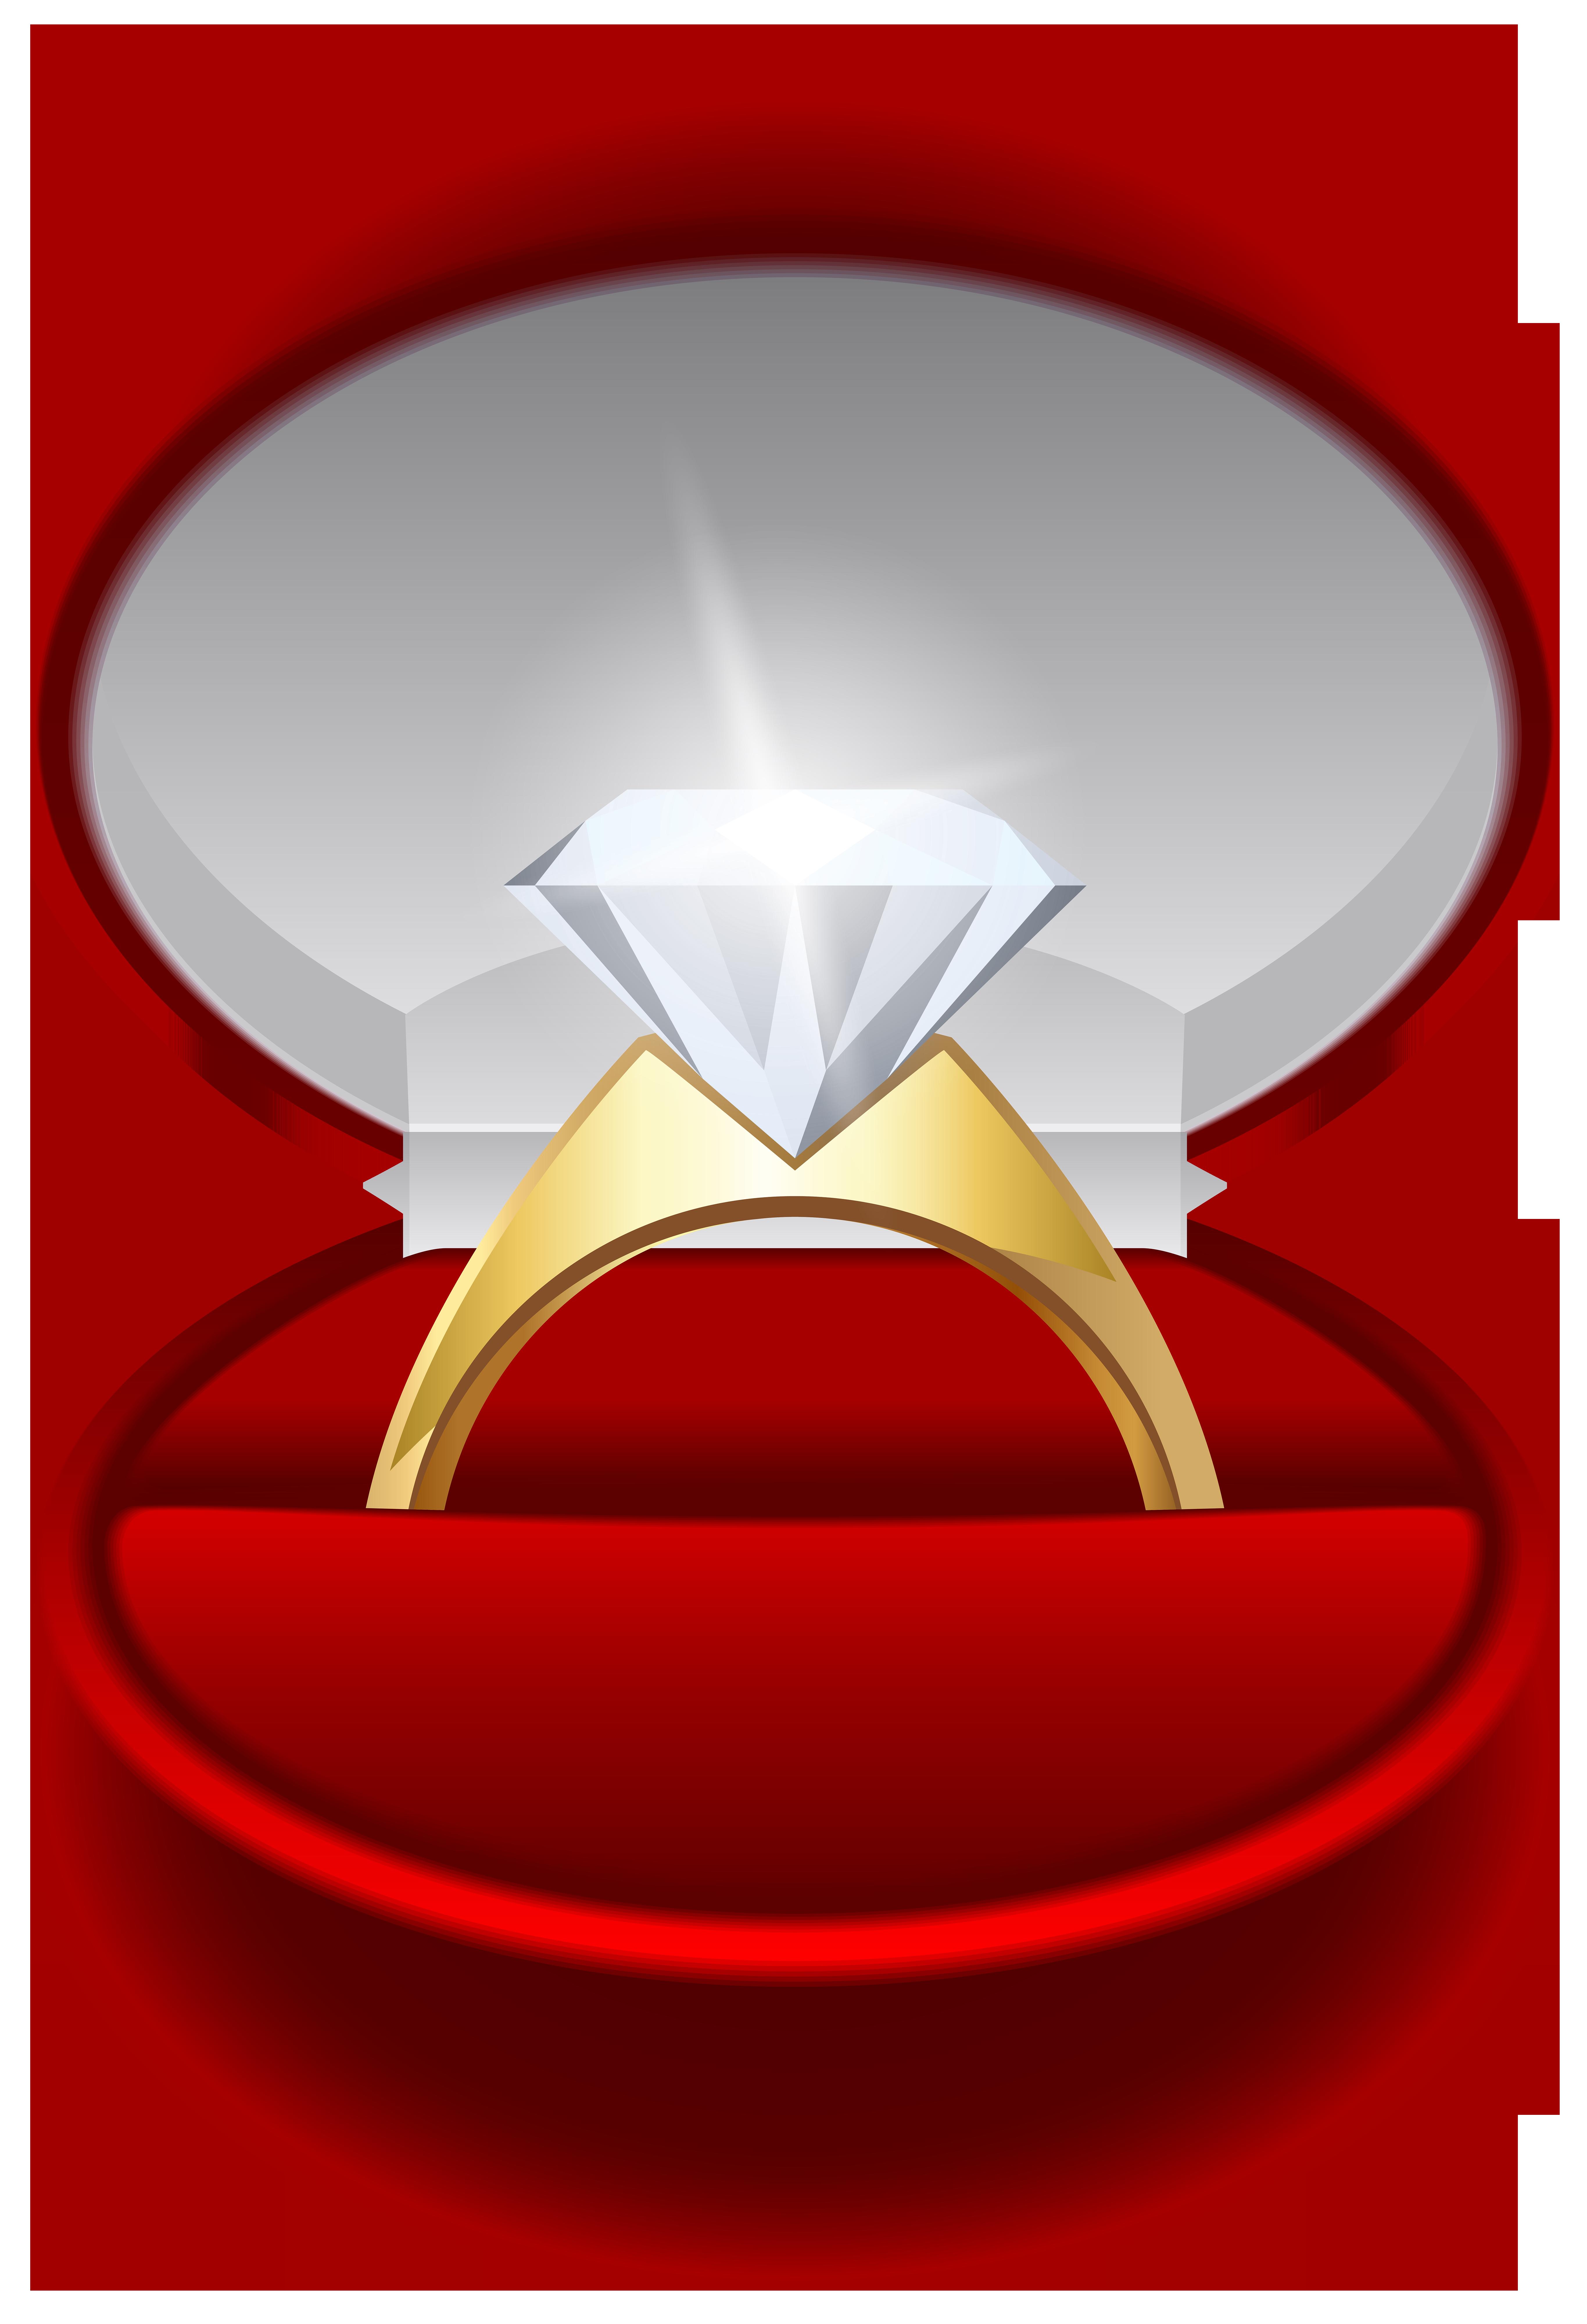 5462x8000 Engagement ring transparent clip art image